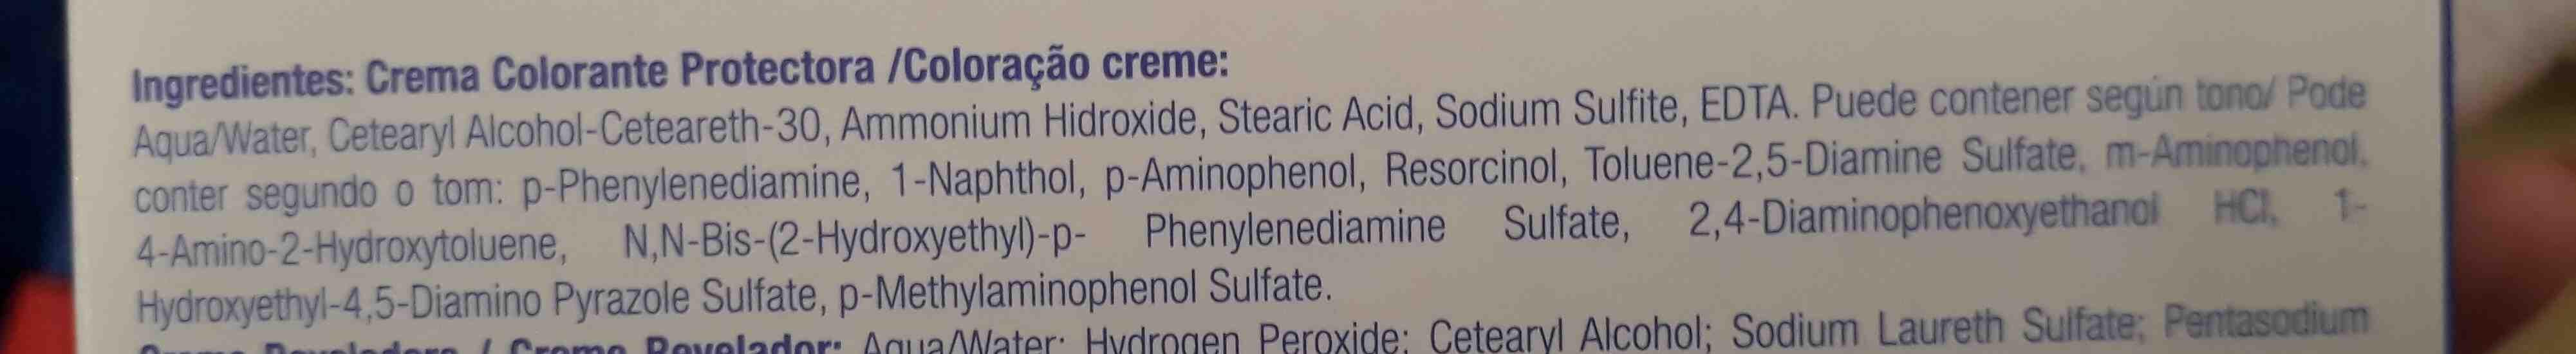 Tintura negro azulado 919 - Ingredients - en